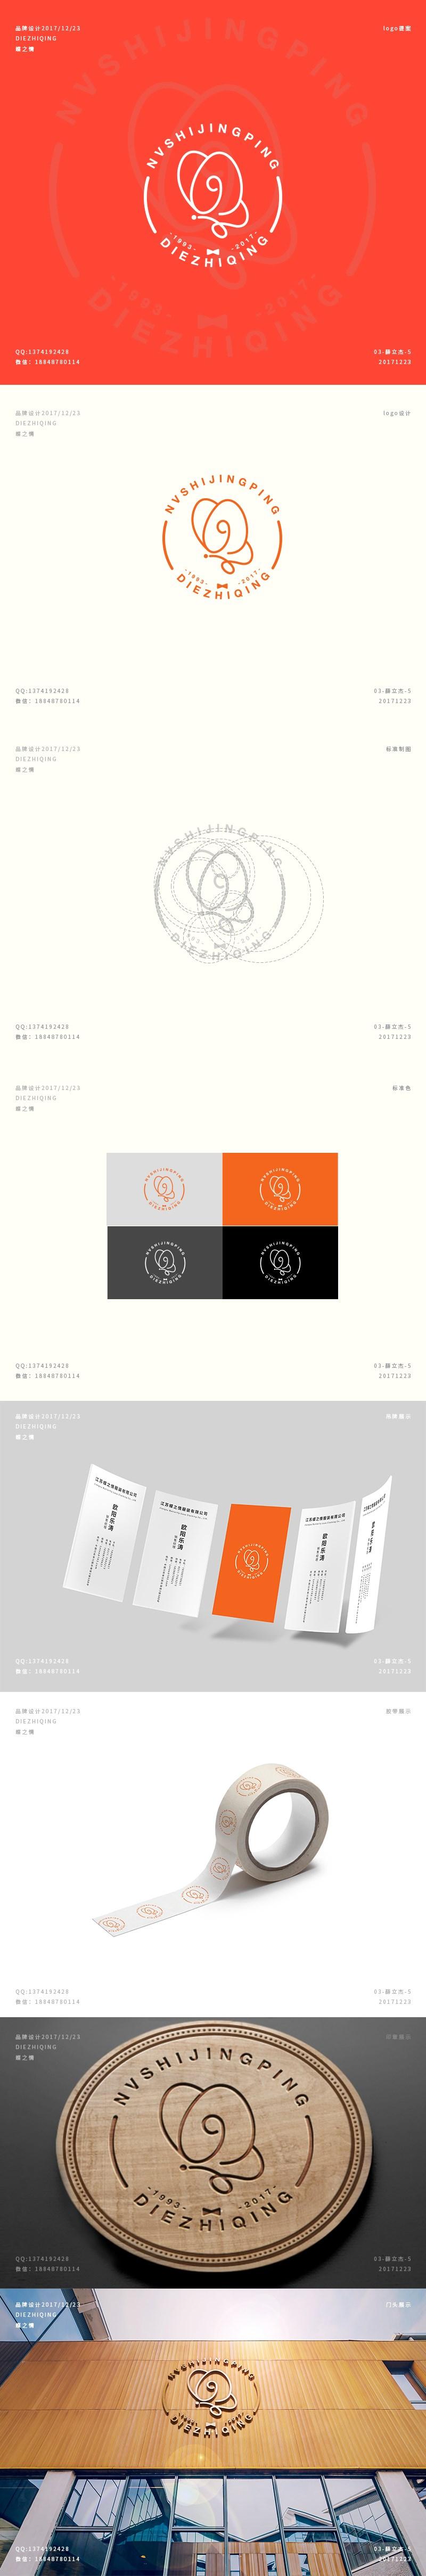 DIE ZHI QING品牌形象设计